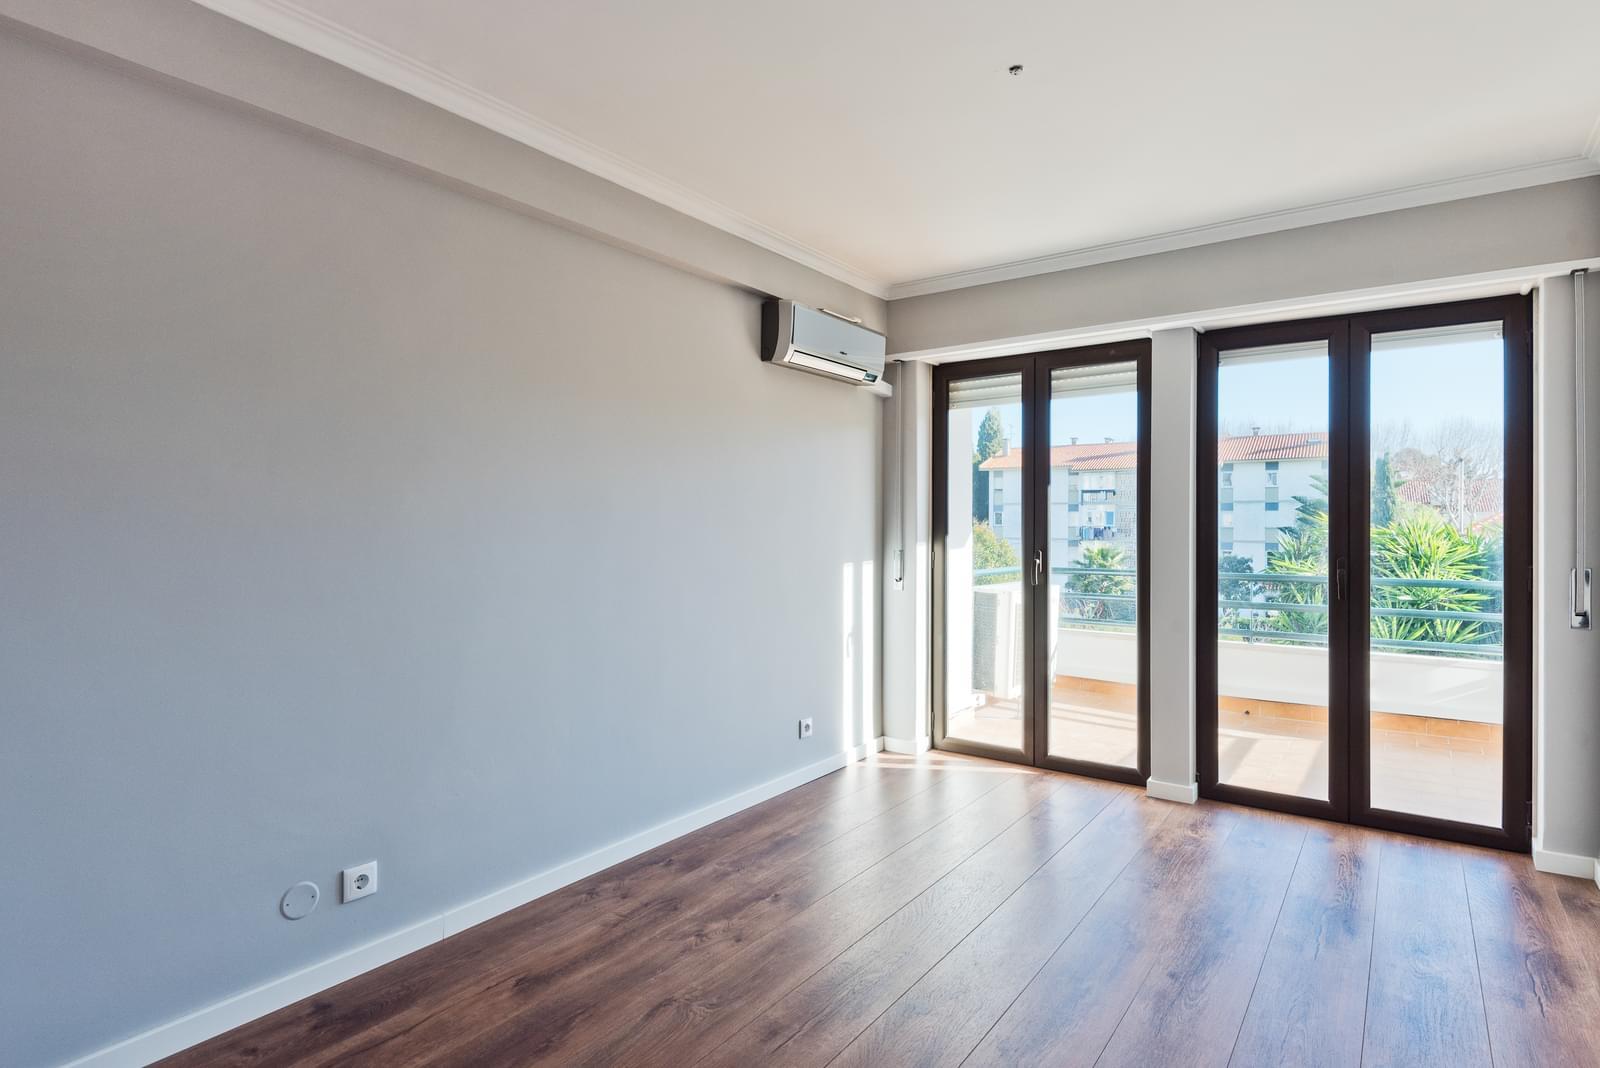 pf18963-apartamento-t5-cascais-9f011256-8aa7-4a42-816c-a24b8e4fdd47